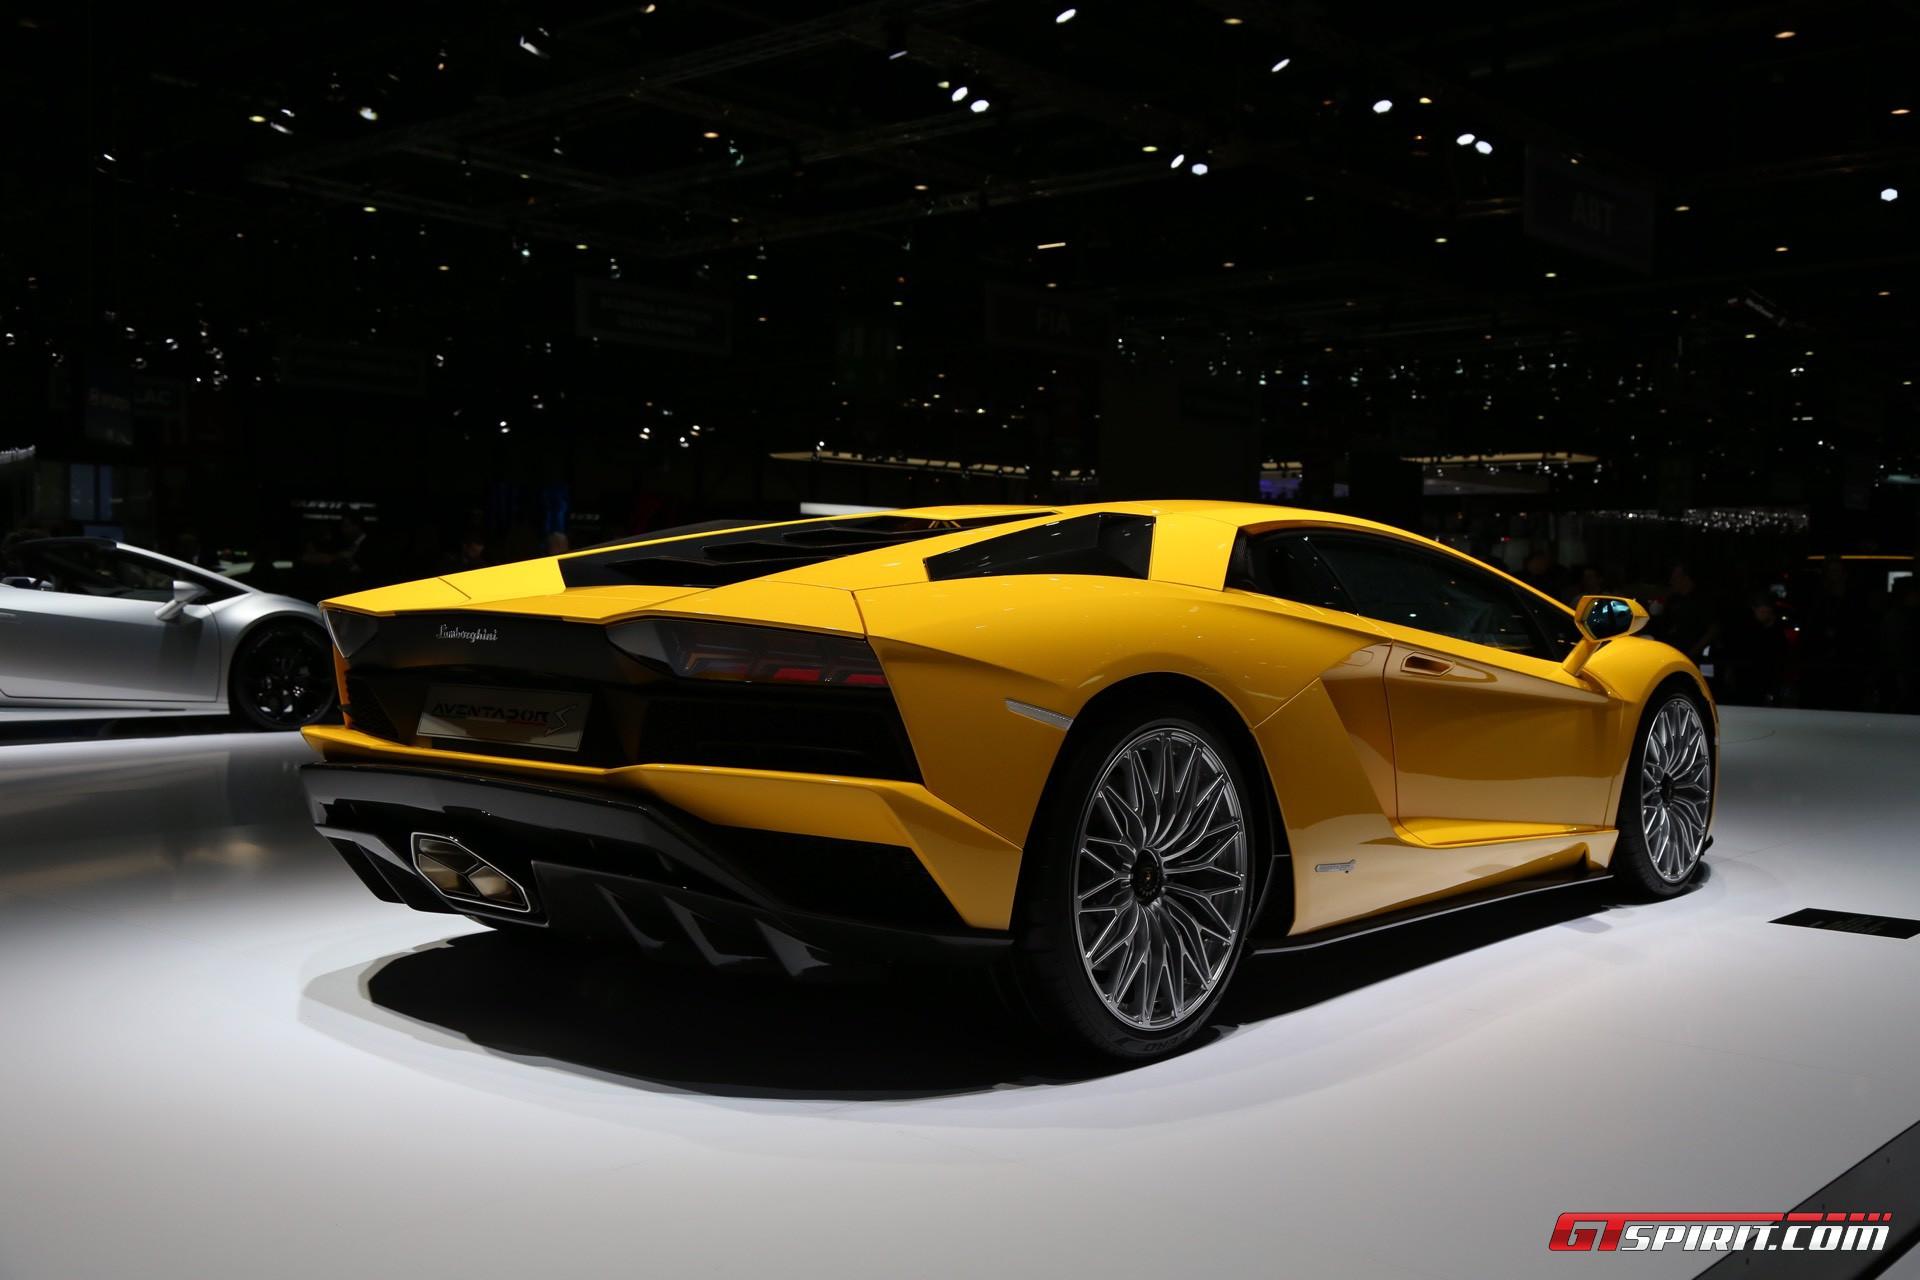 Geneva 2017: Lamborghini Aventador S - GTspirit